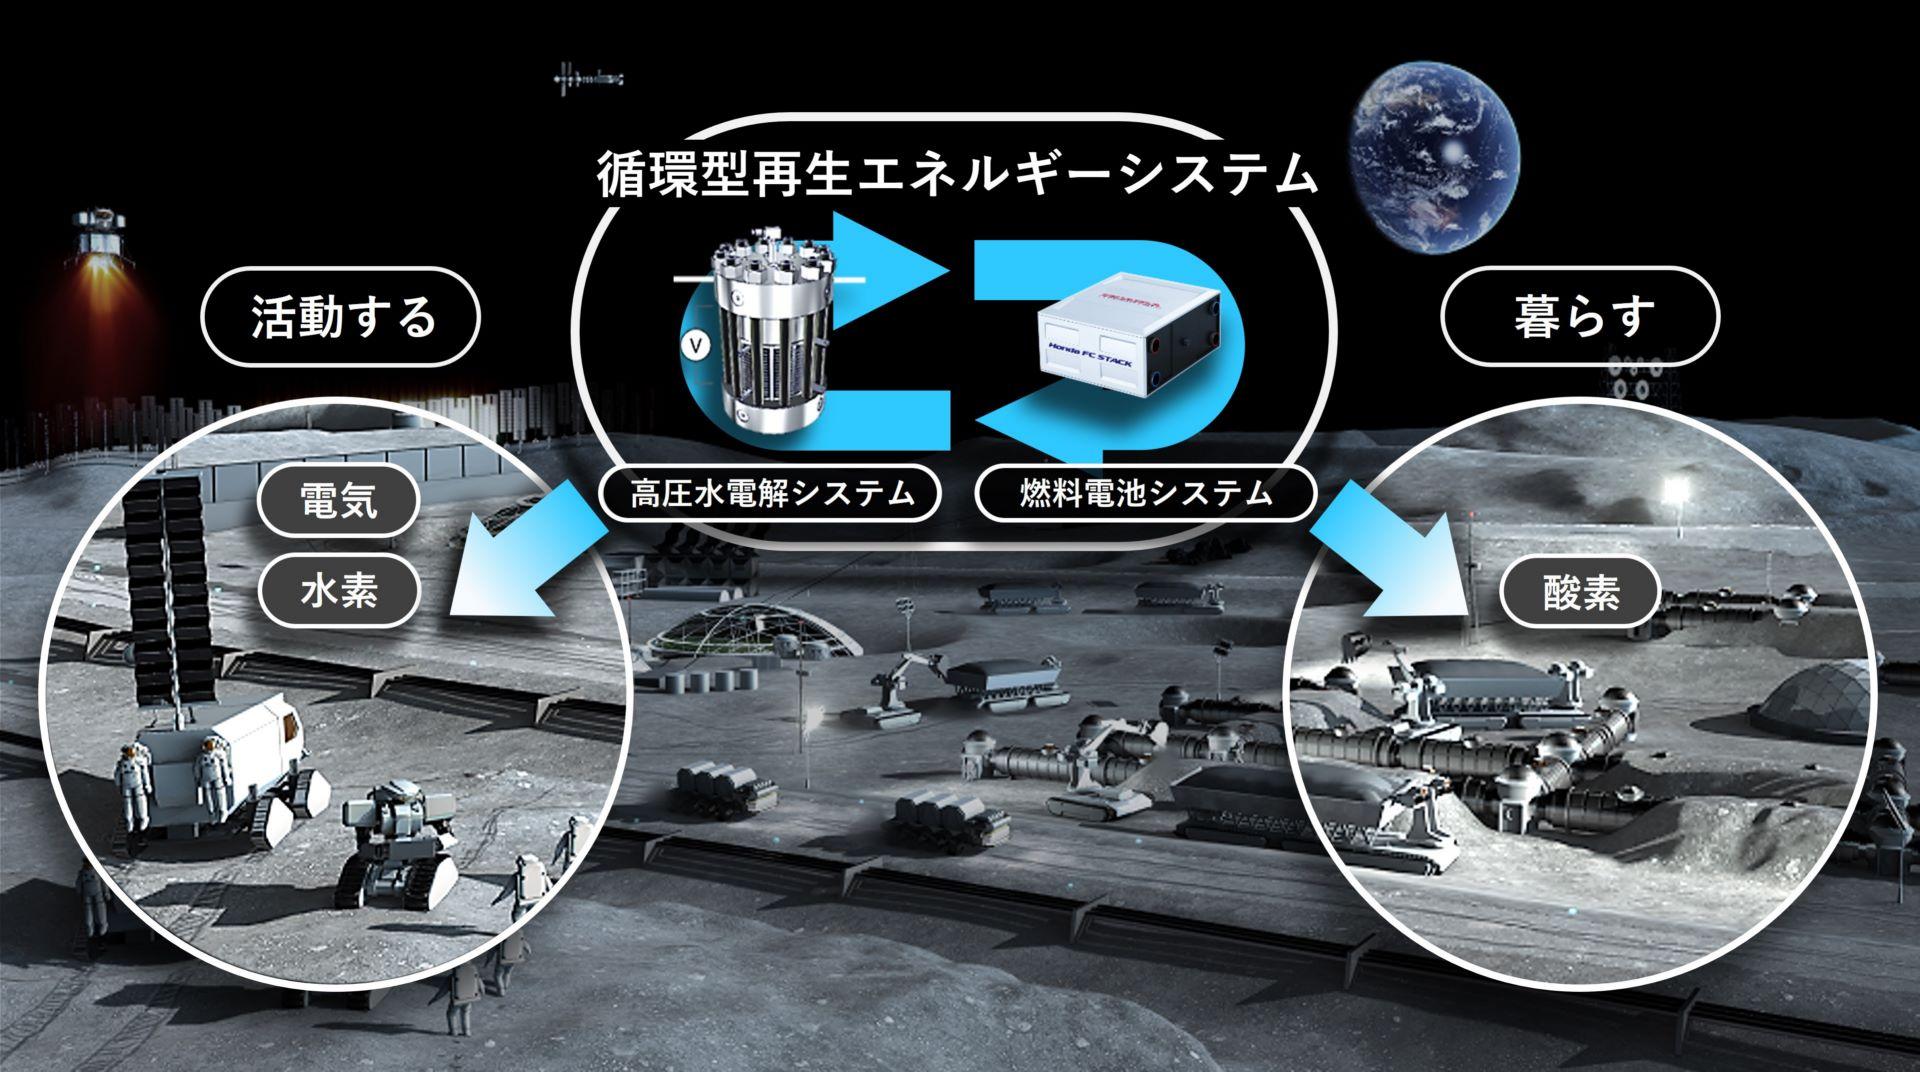 honda-moon-plans-4